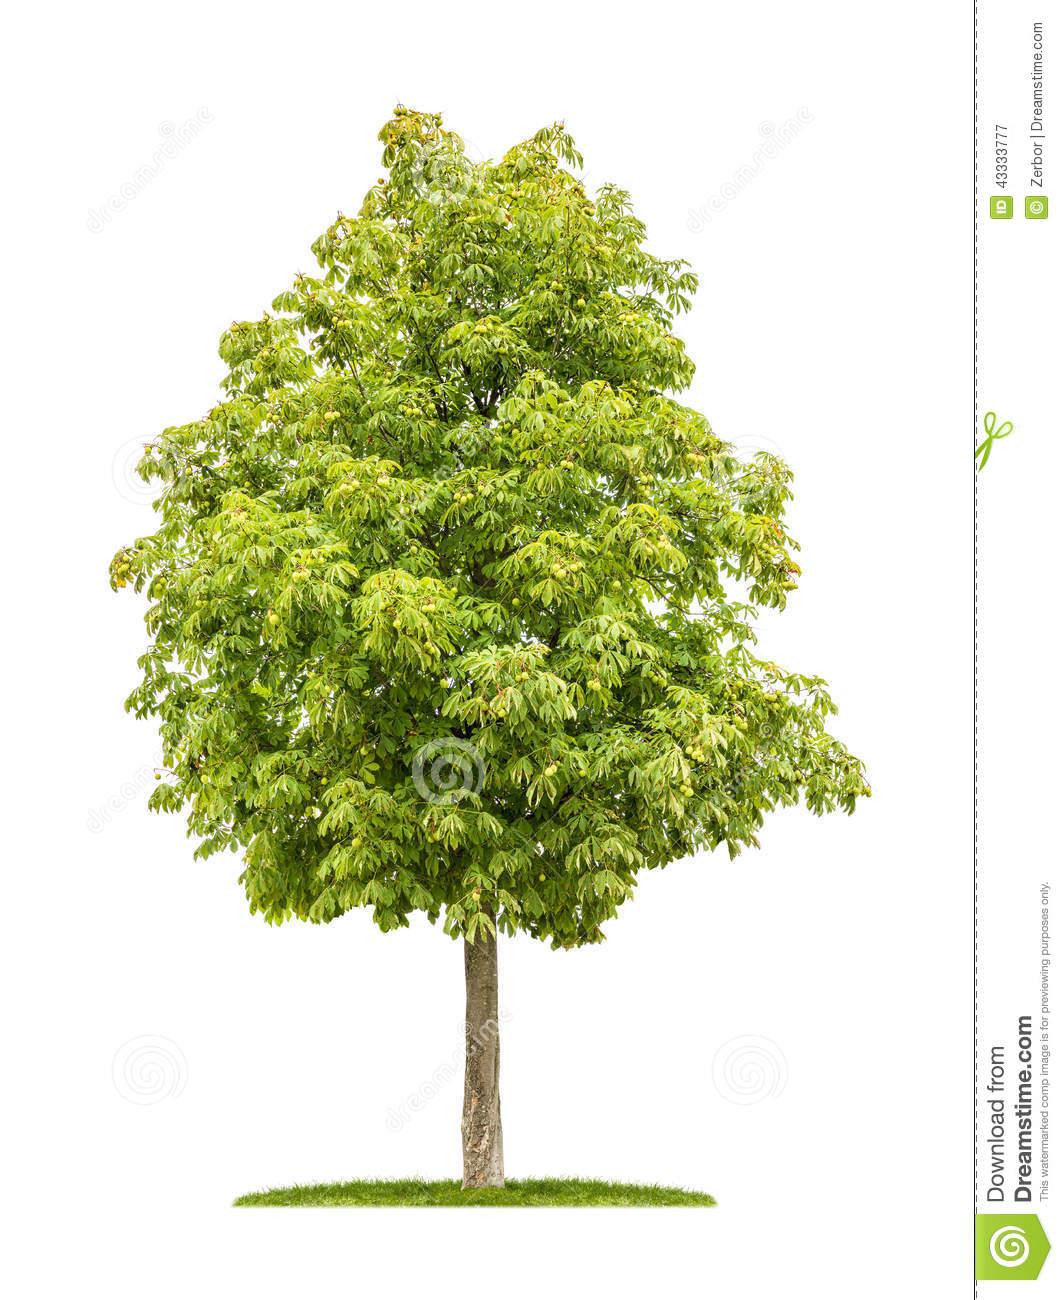 Horse Chestnut Tree On A White Background Stock Photo.